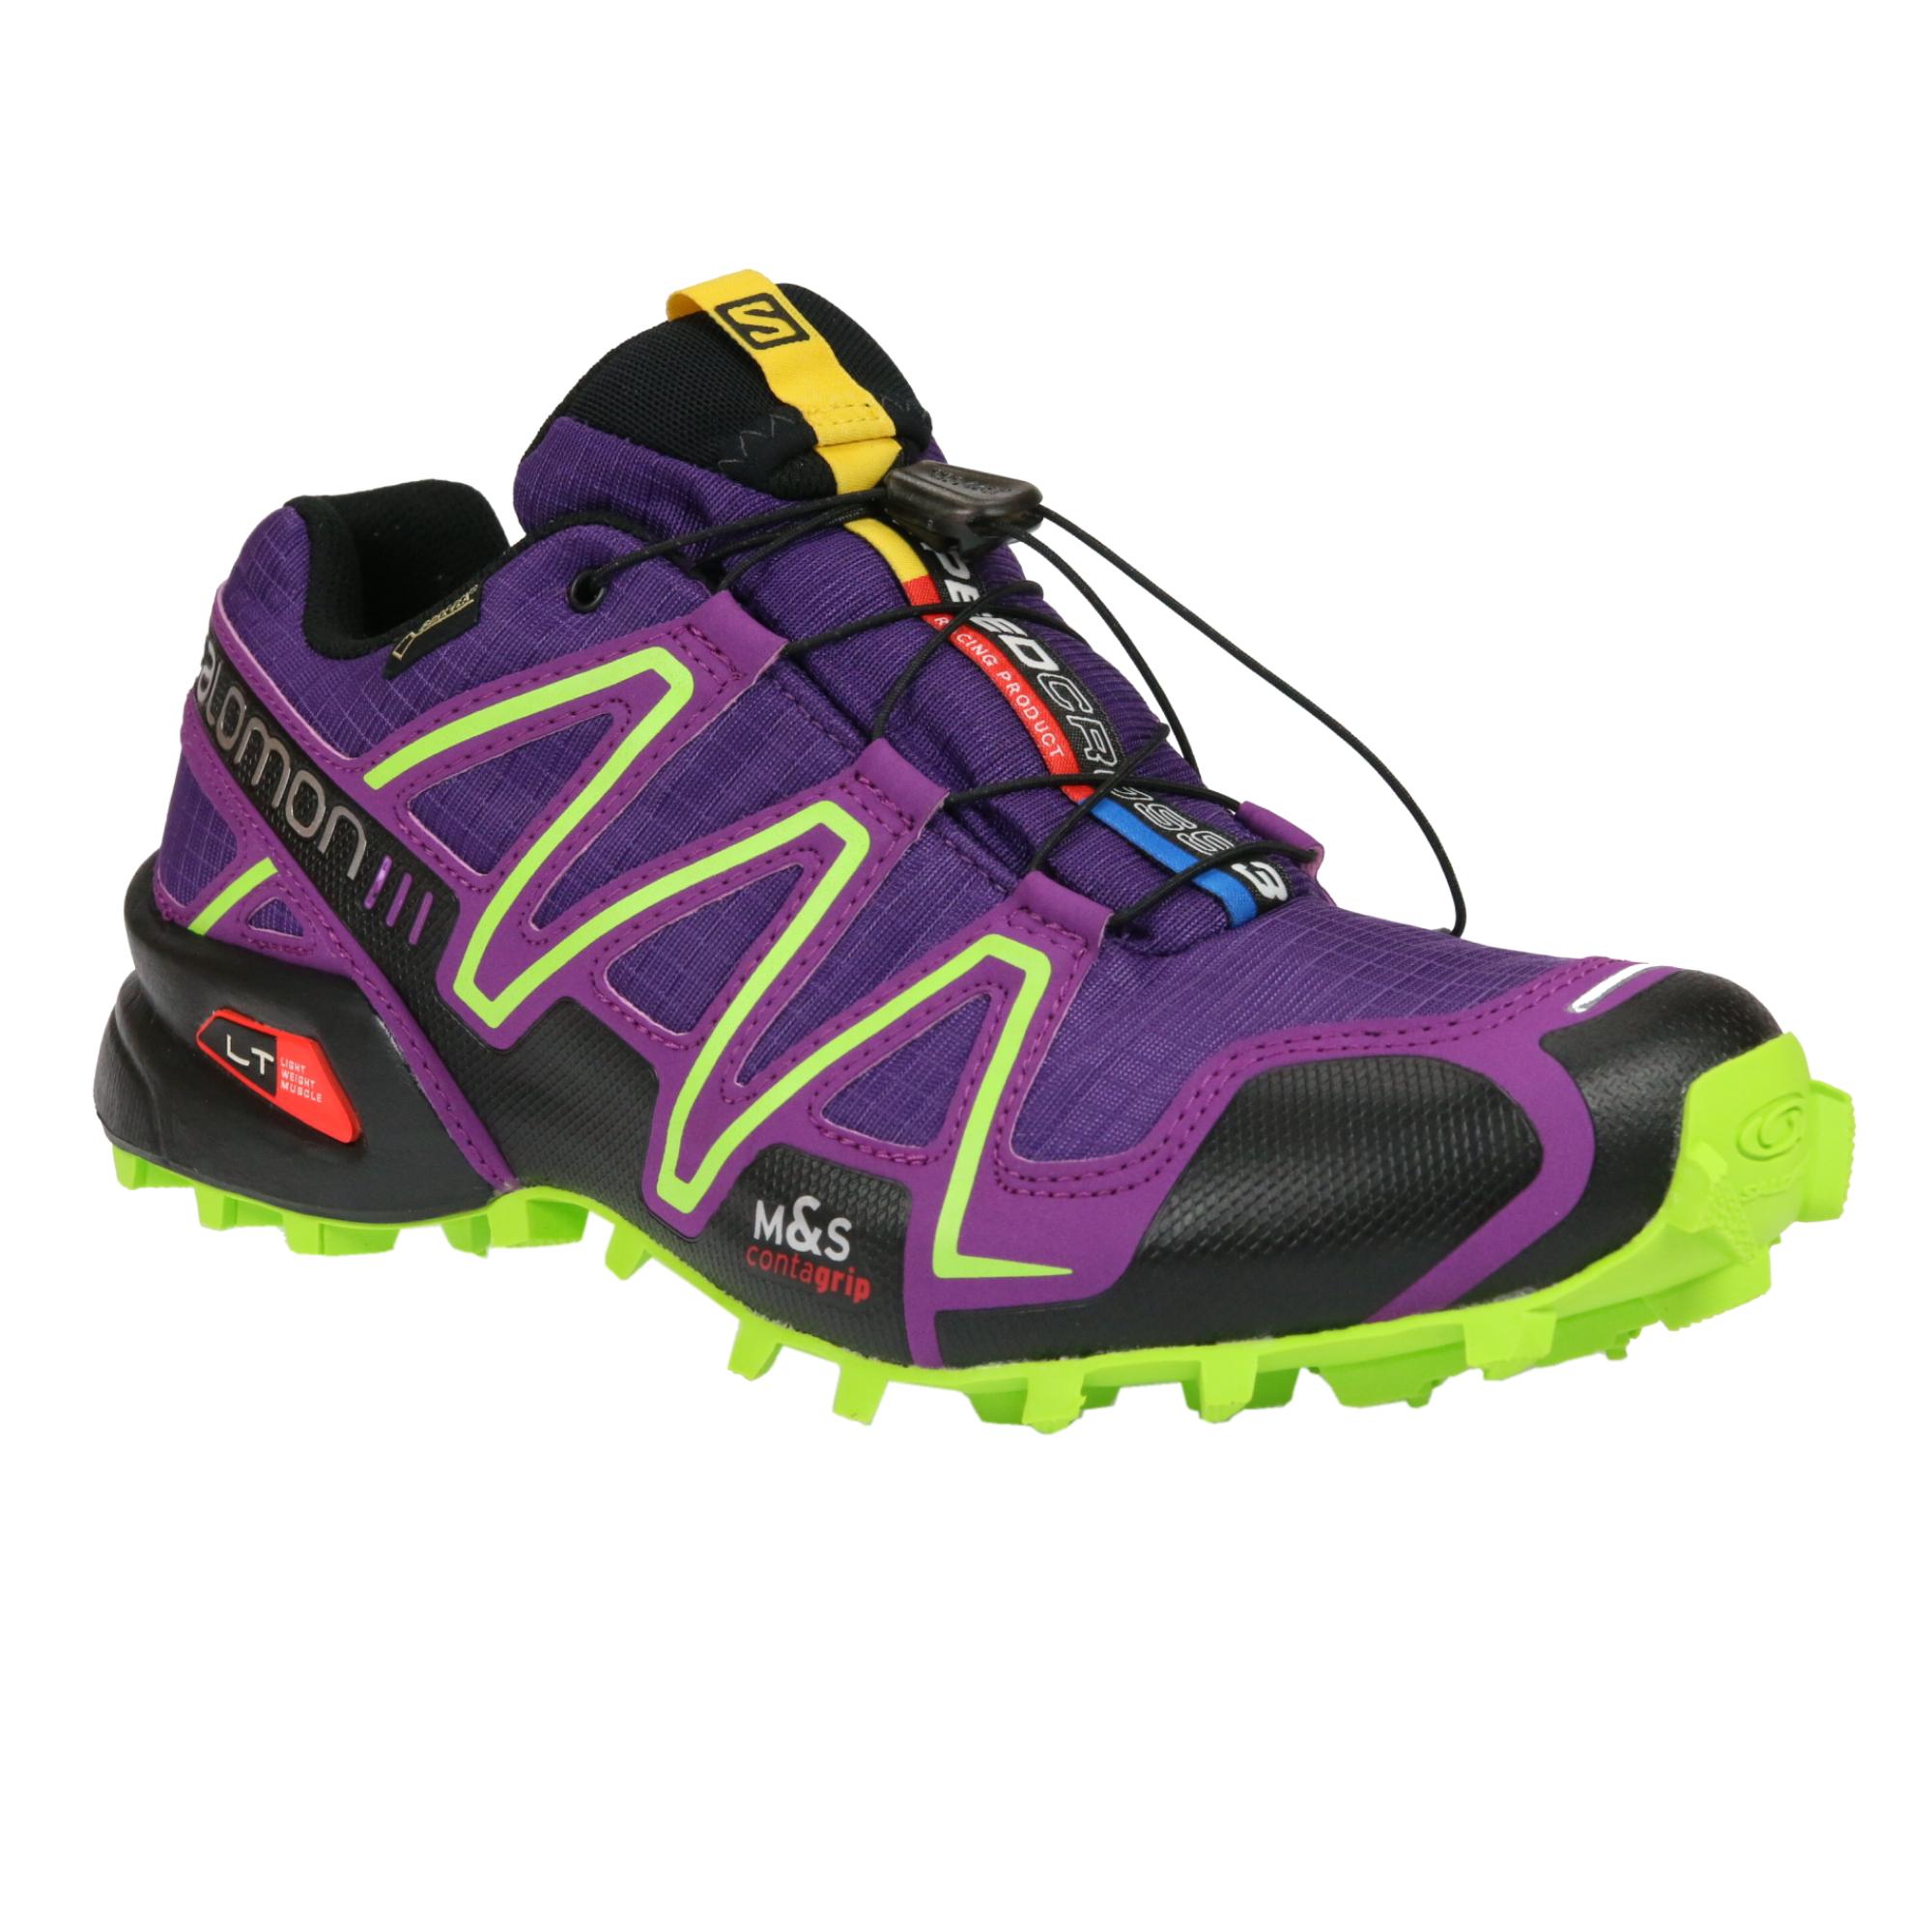 Salomon X Tour  Running Shoes